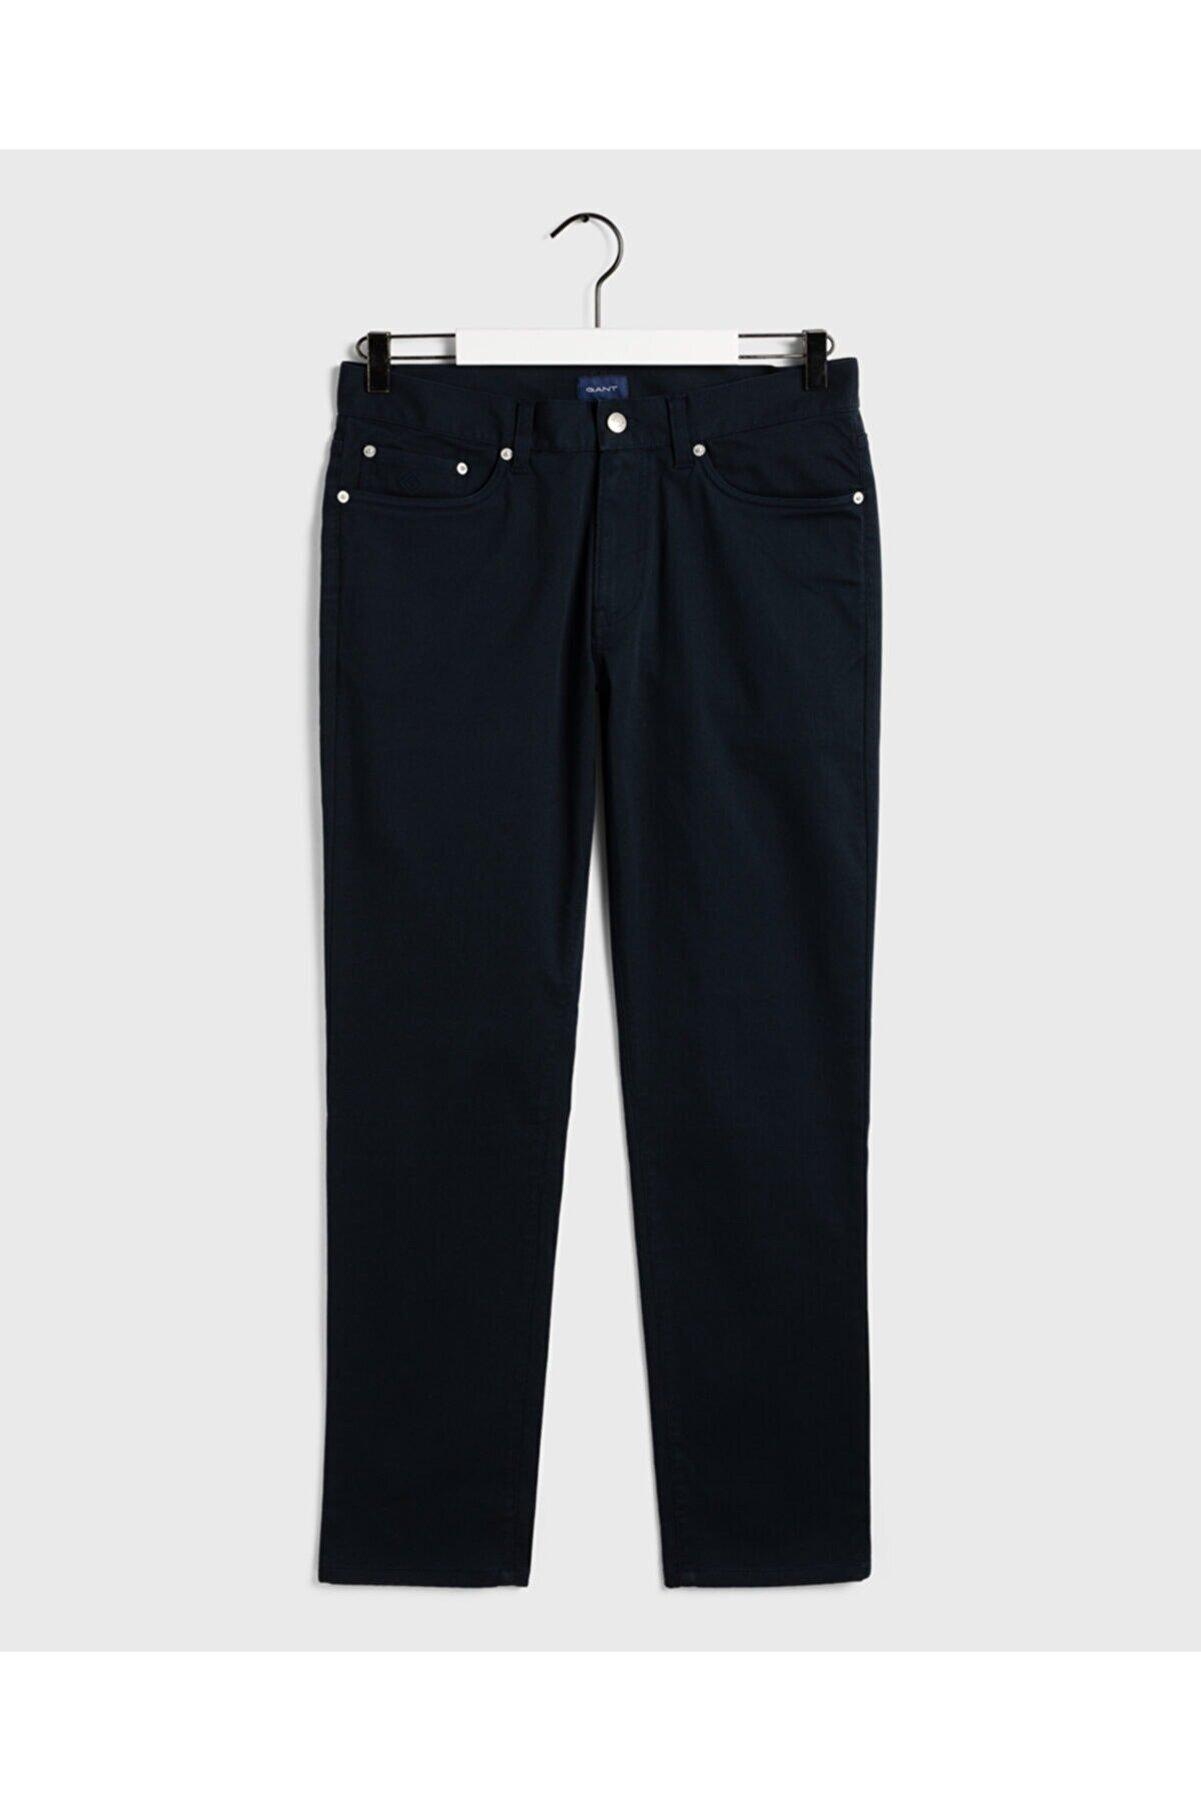 Gant Erkek Lacivert Slim Fit Tech Prep Pantolon